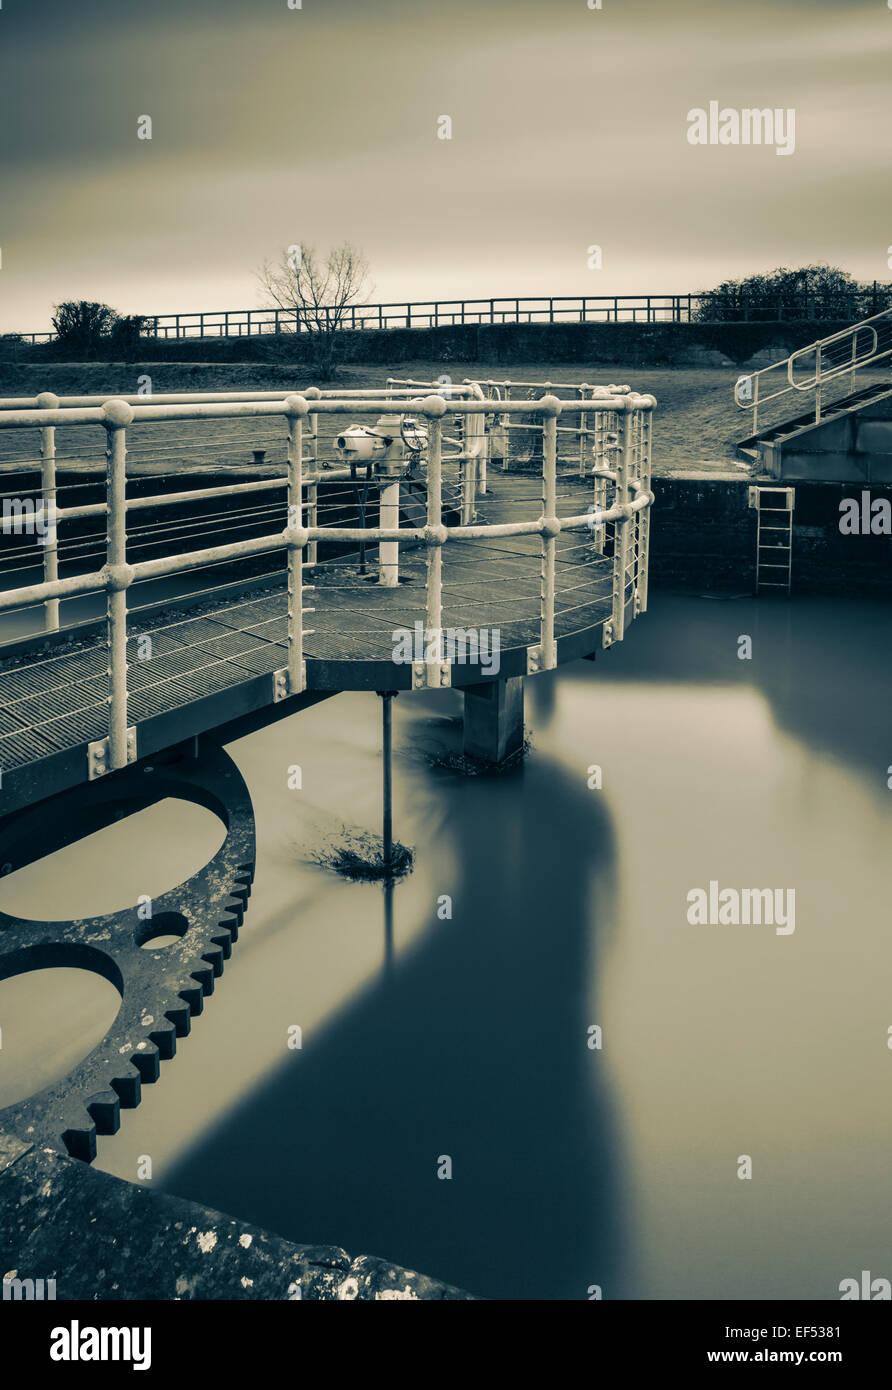 Lock gates, Lydney canal. - Stock Image